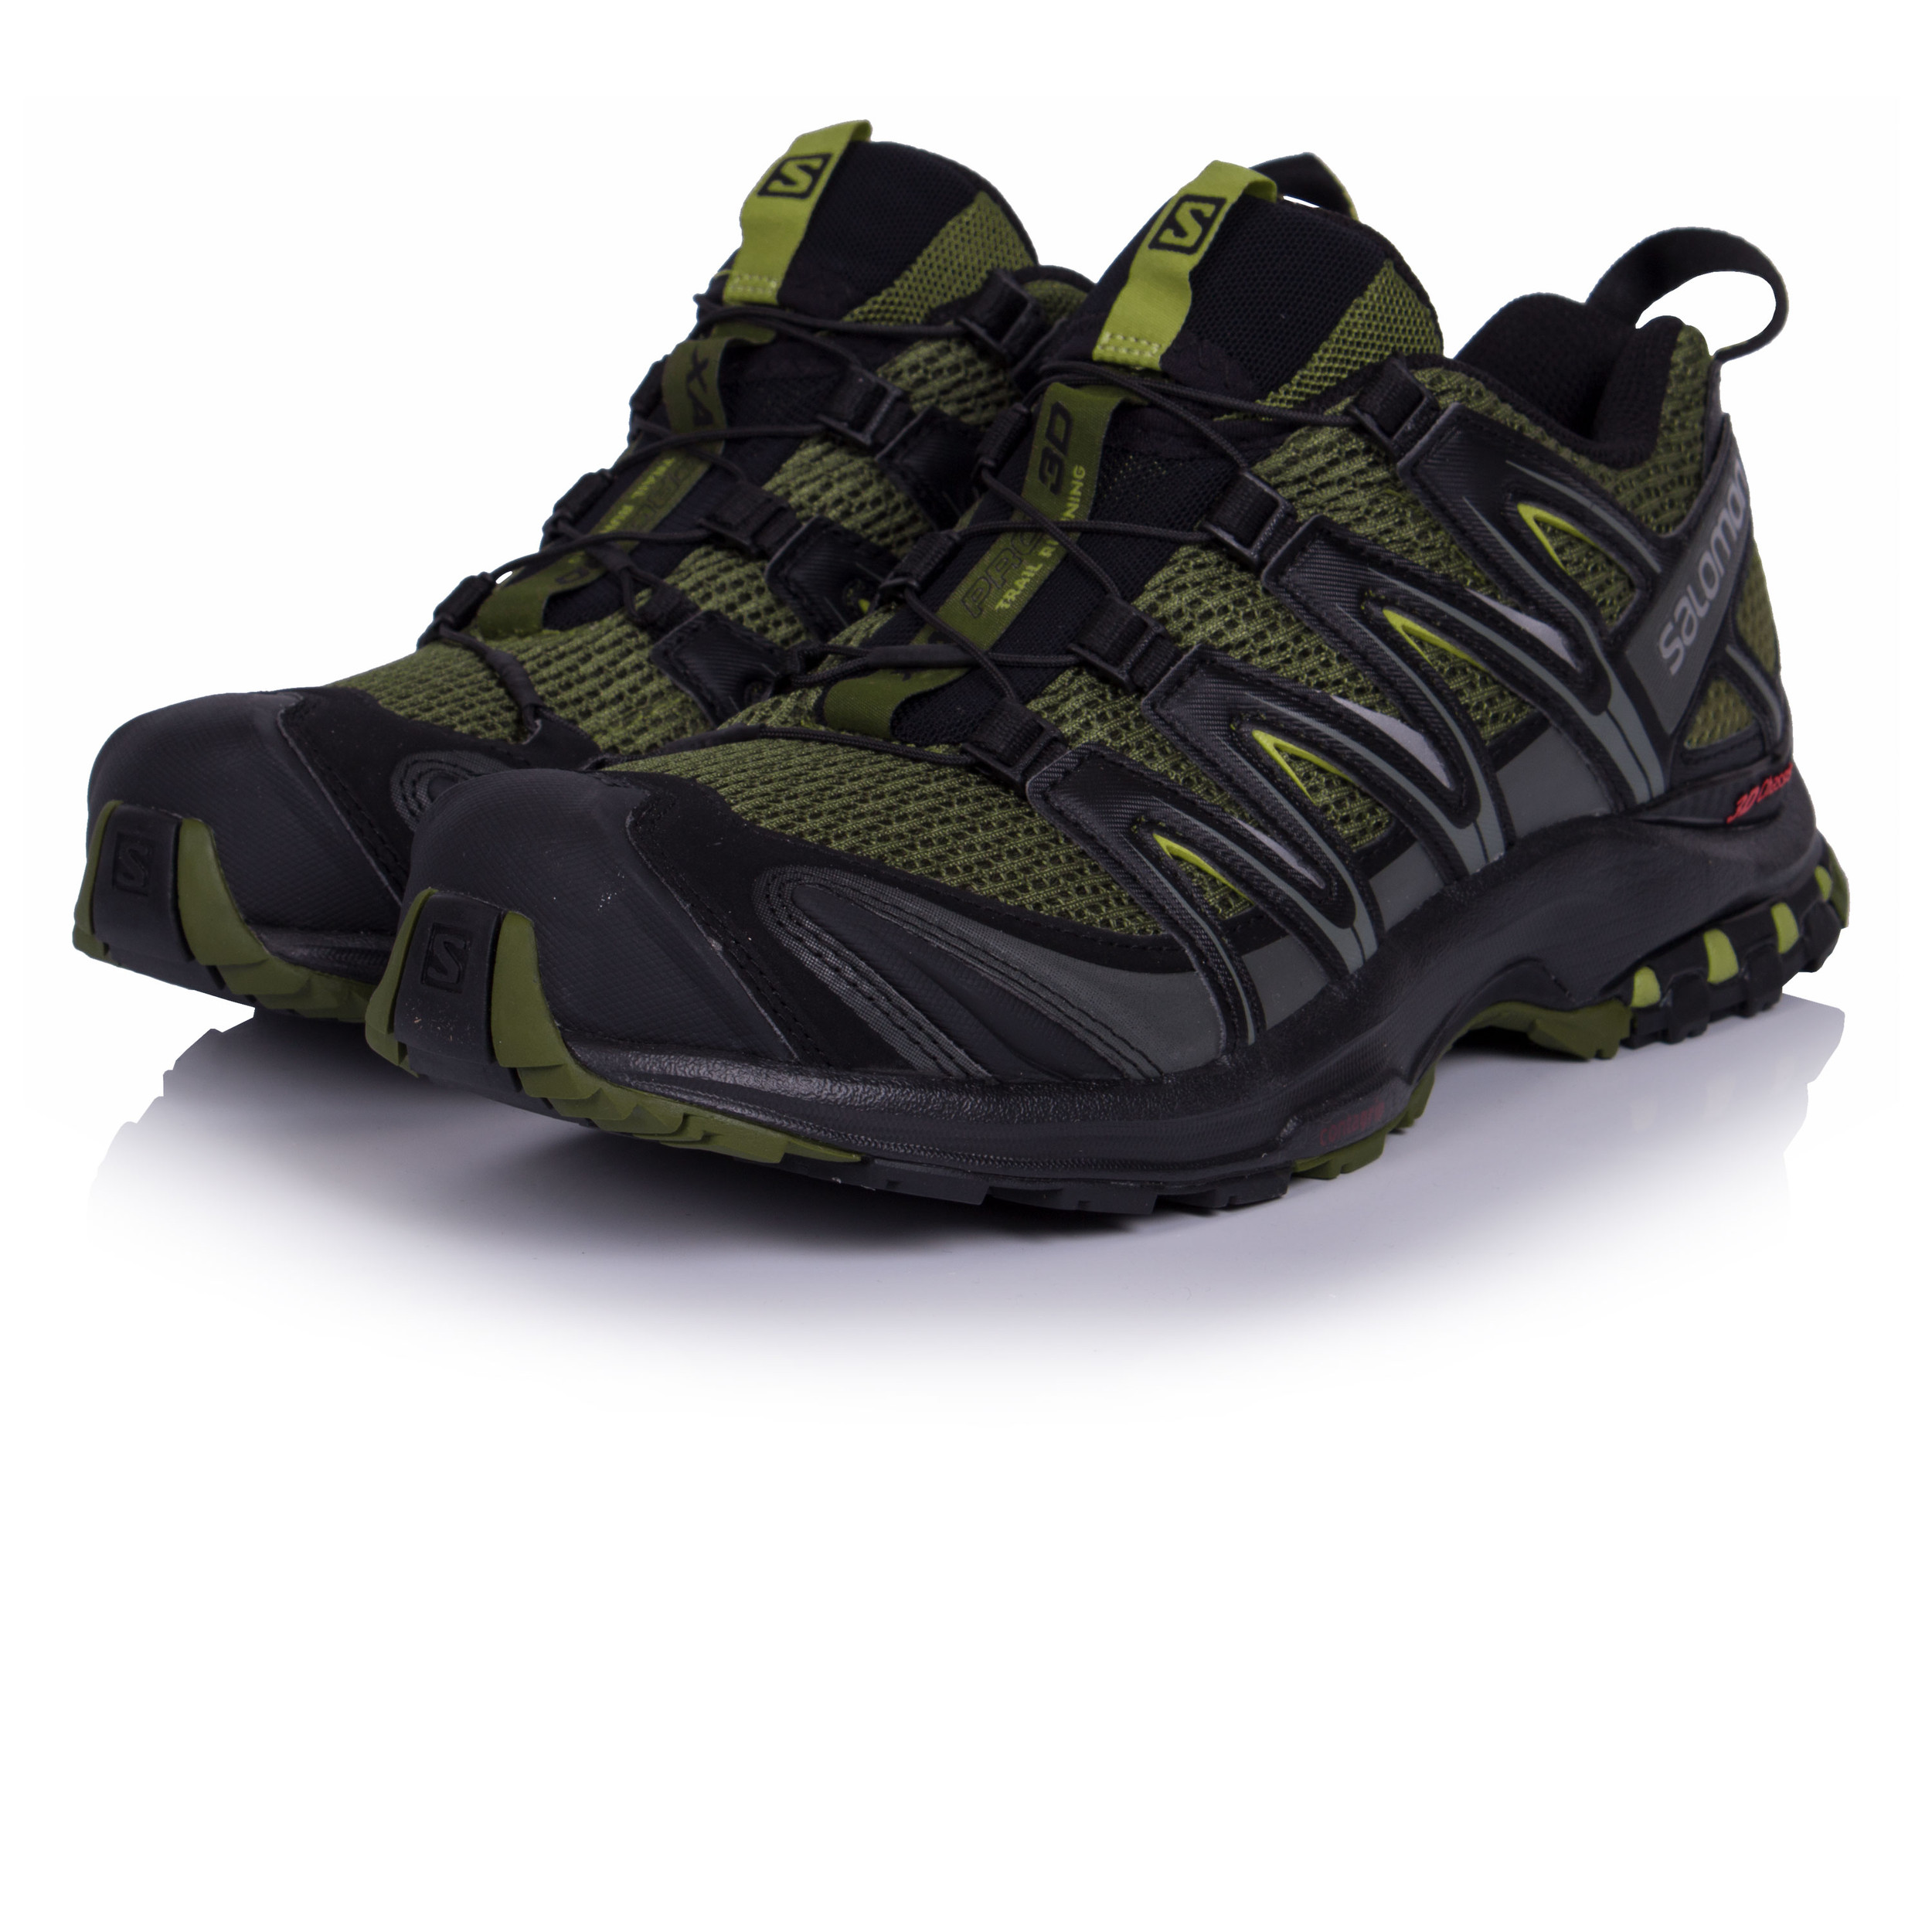 3d Xa Marche Noir Pro Homme Trail Salomon Chaussure De Vert Camping n8wk0OPX